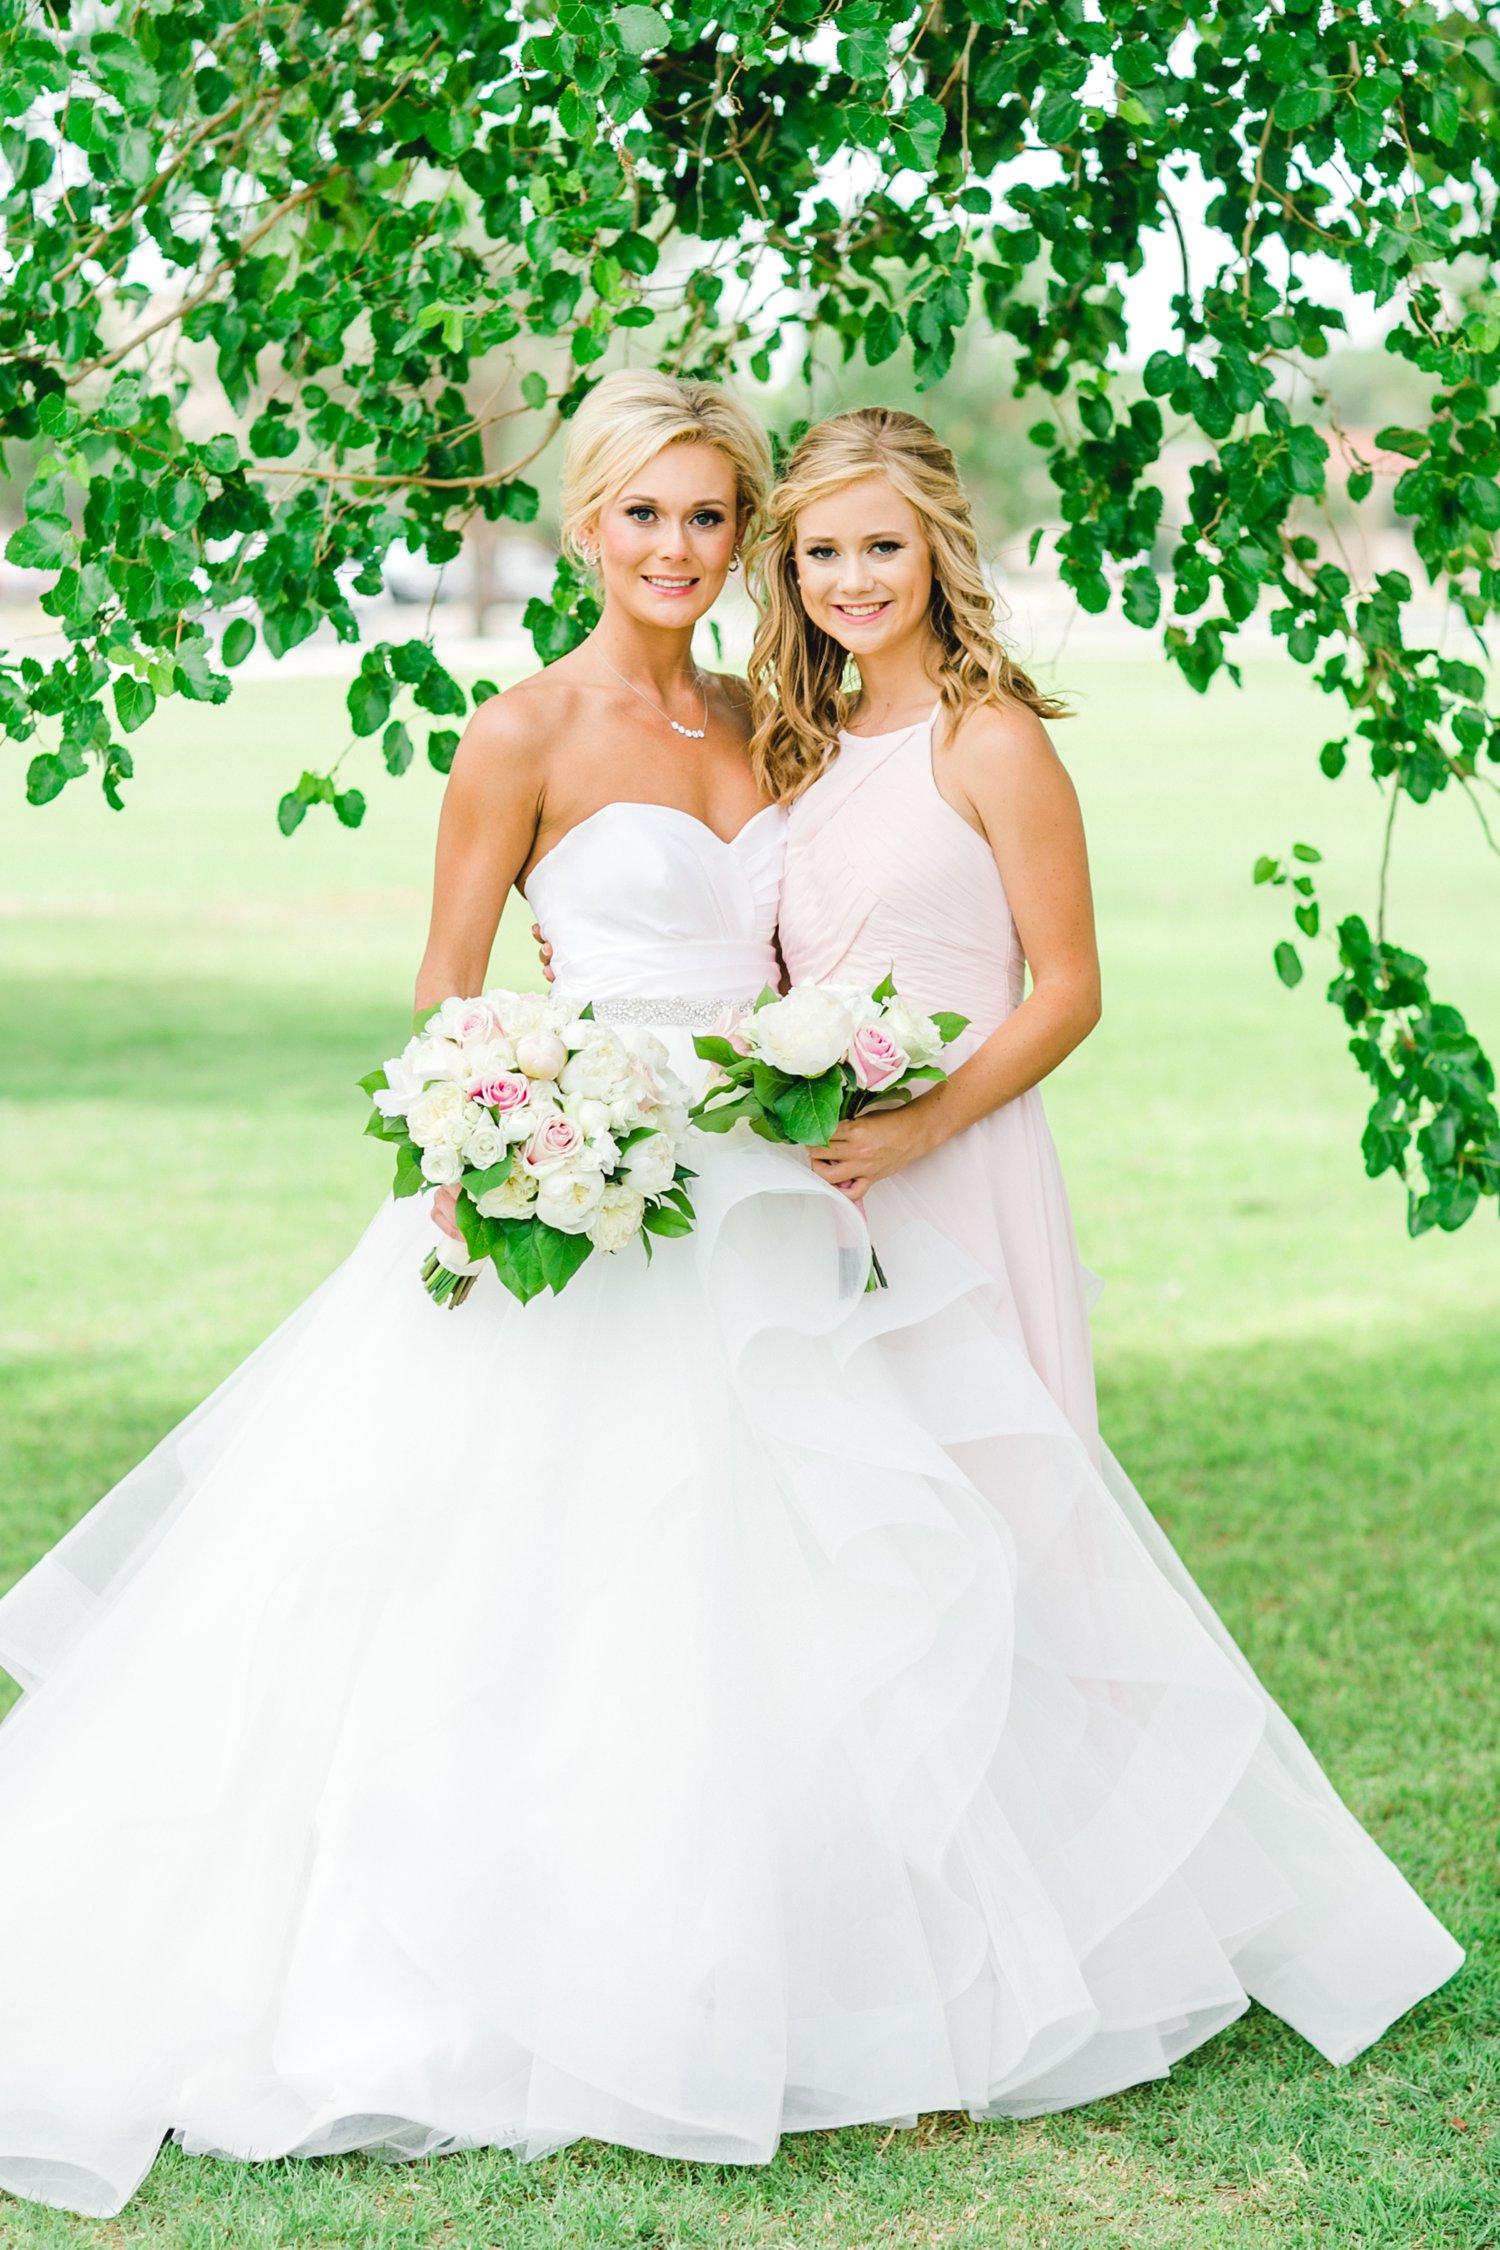 Taylor-and-Brock-Williams-Texas-Tech-University-Merket-Alumni-Center-Lubbock-Photographer-ALLEEJ0057.jpg